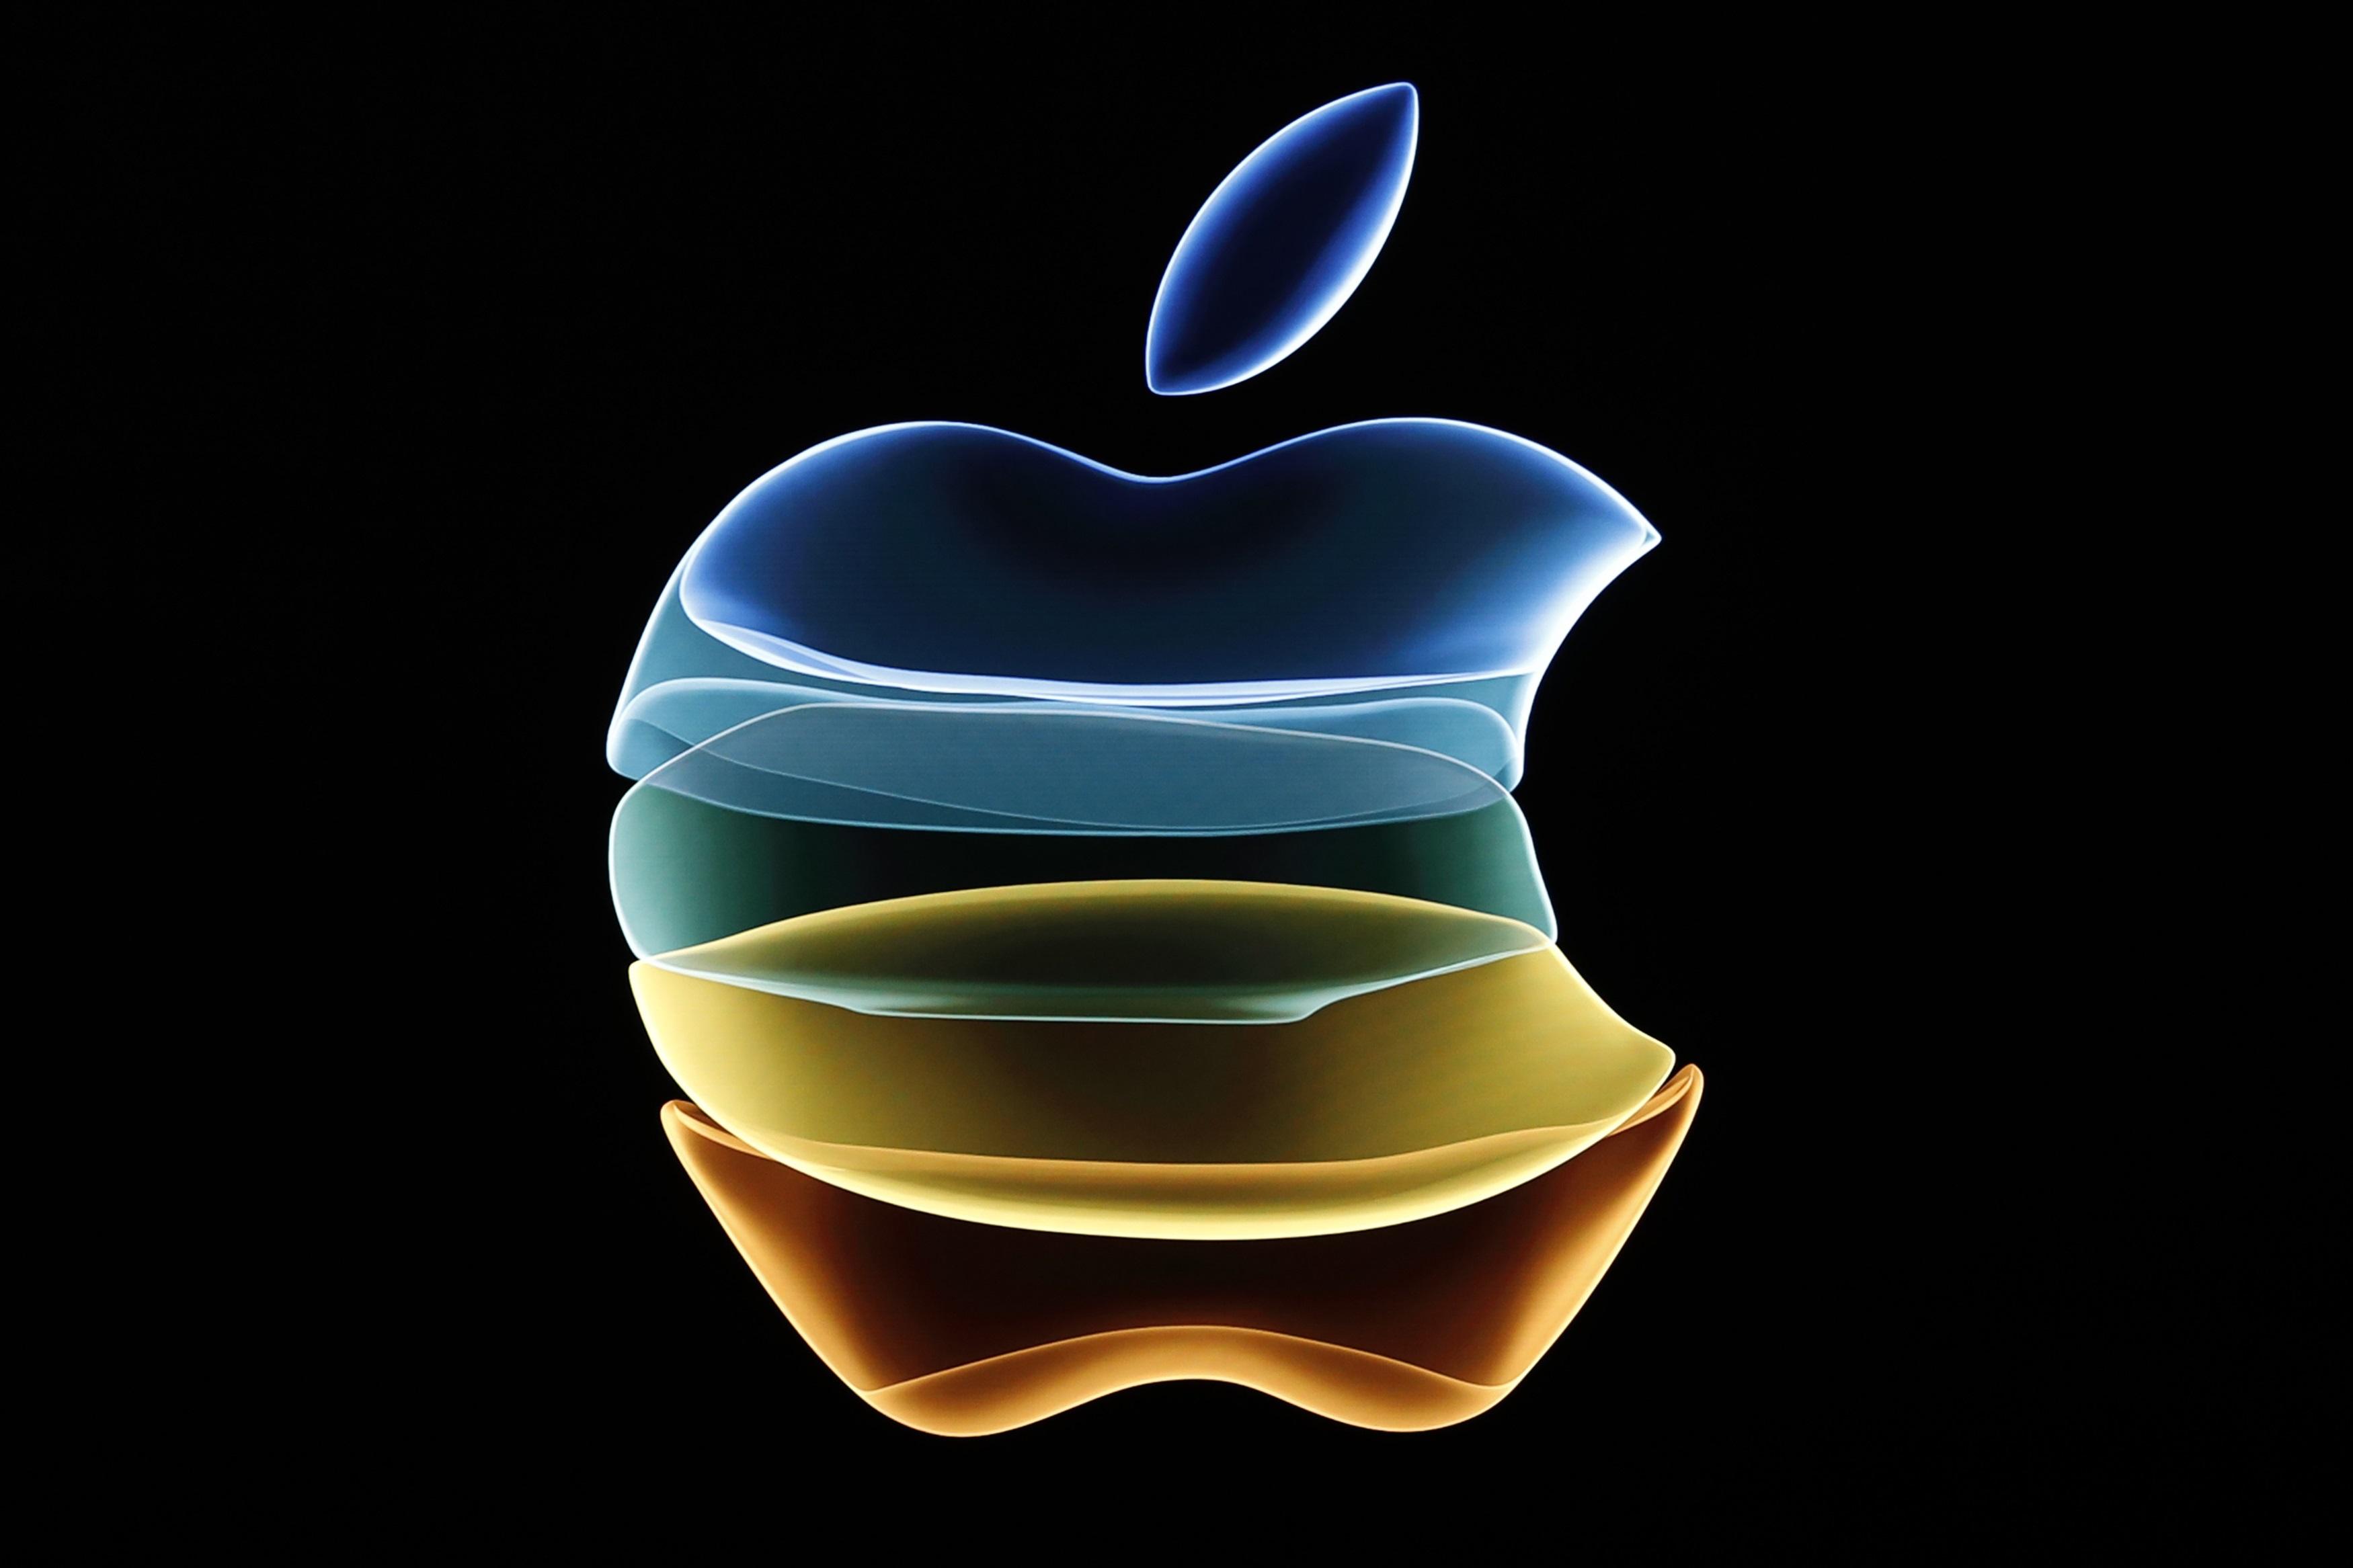 Apple η… εκλεκτή – Έτοιμος να την εξαιρέσει Τραμπ από τους δασμούς προς την Κίνα